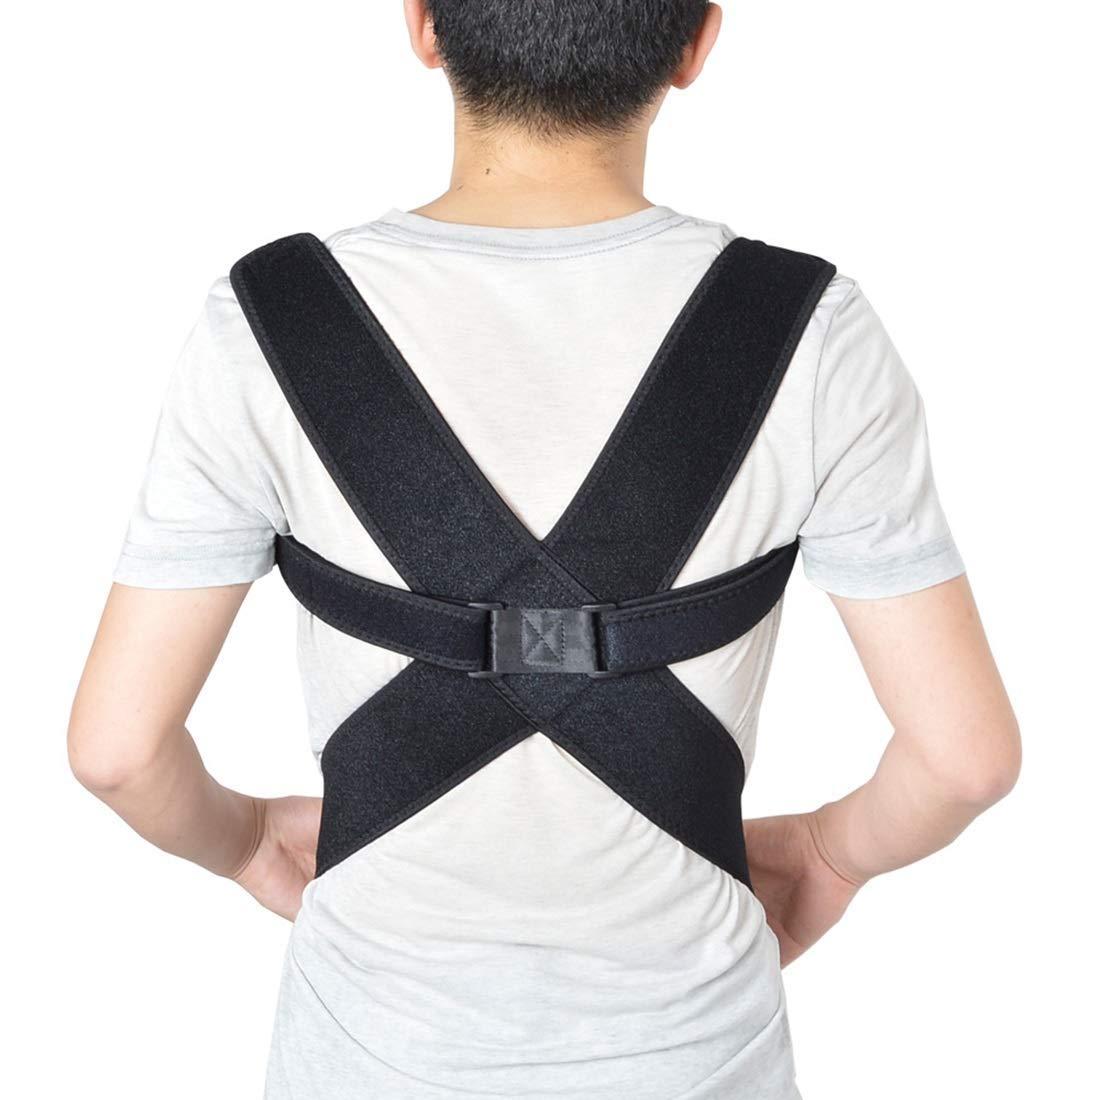 MISSKERVINFENDRIYUN YY4 Humpback Correction Belt Adult Spine Back Correction Belt Adjustable Elastic Size Correction Belt Invisible Correction Belt (Color : Black, Size : M)